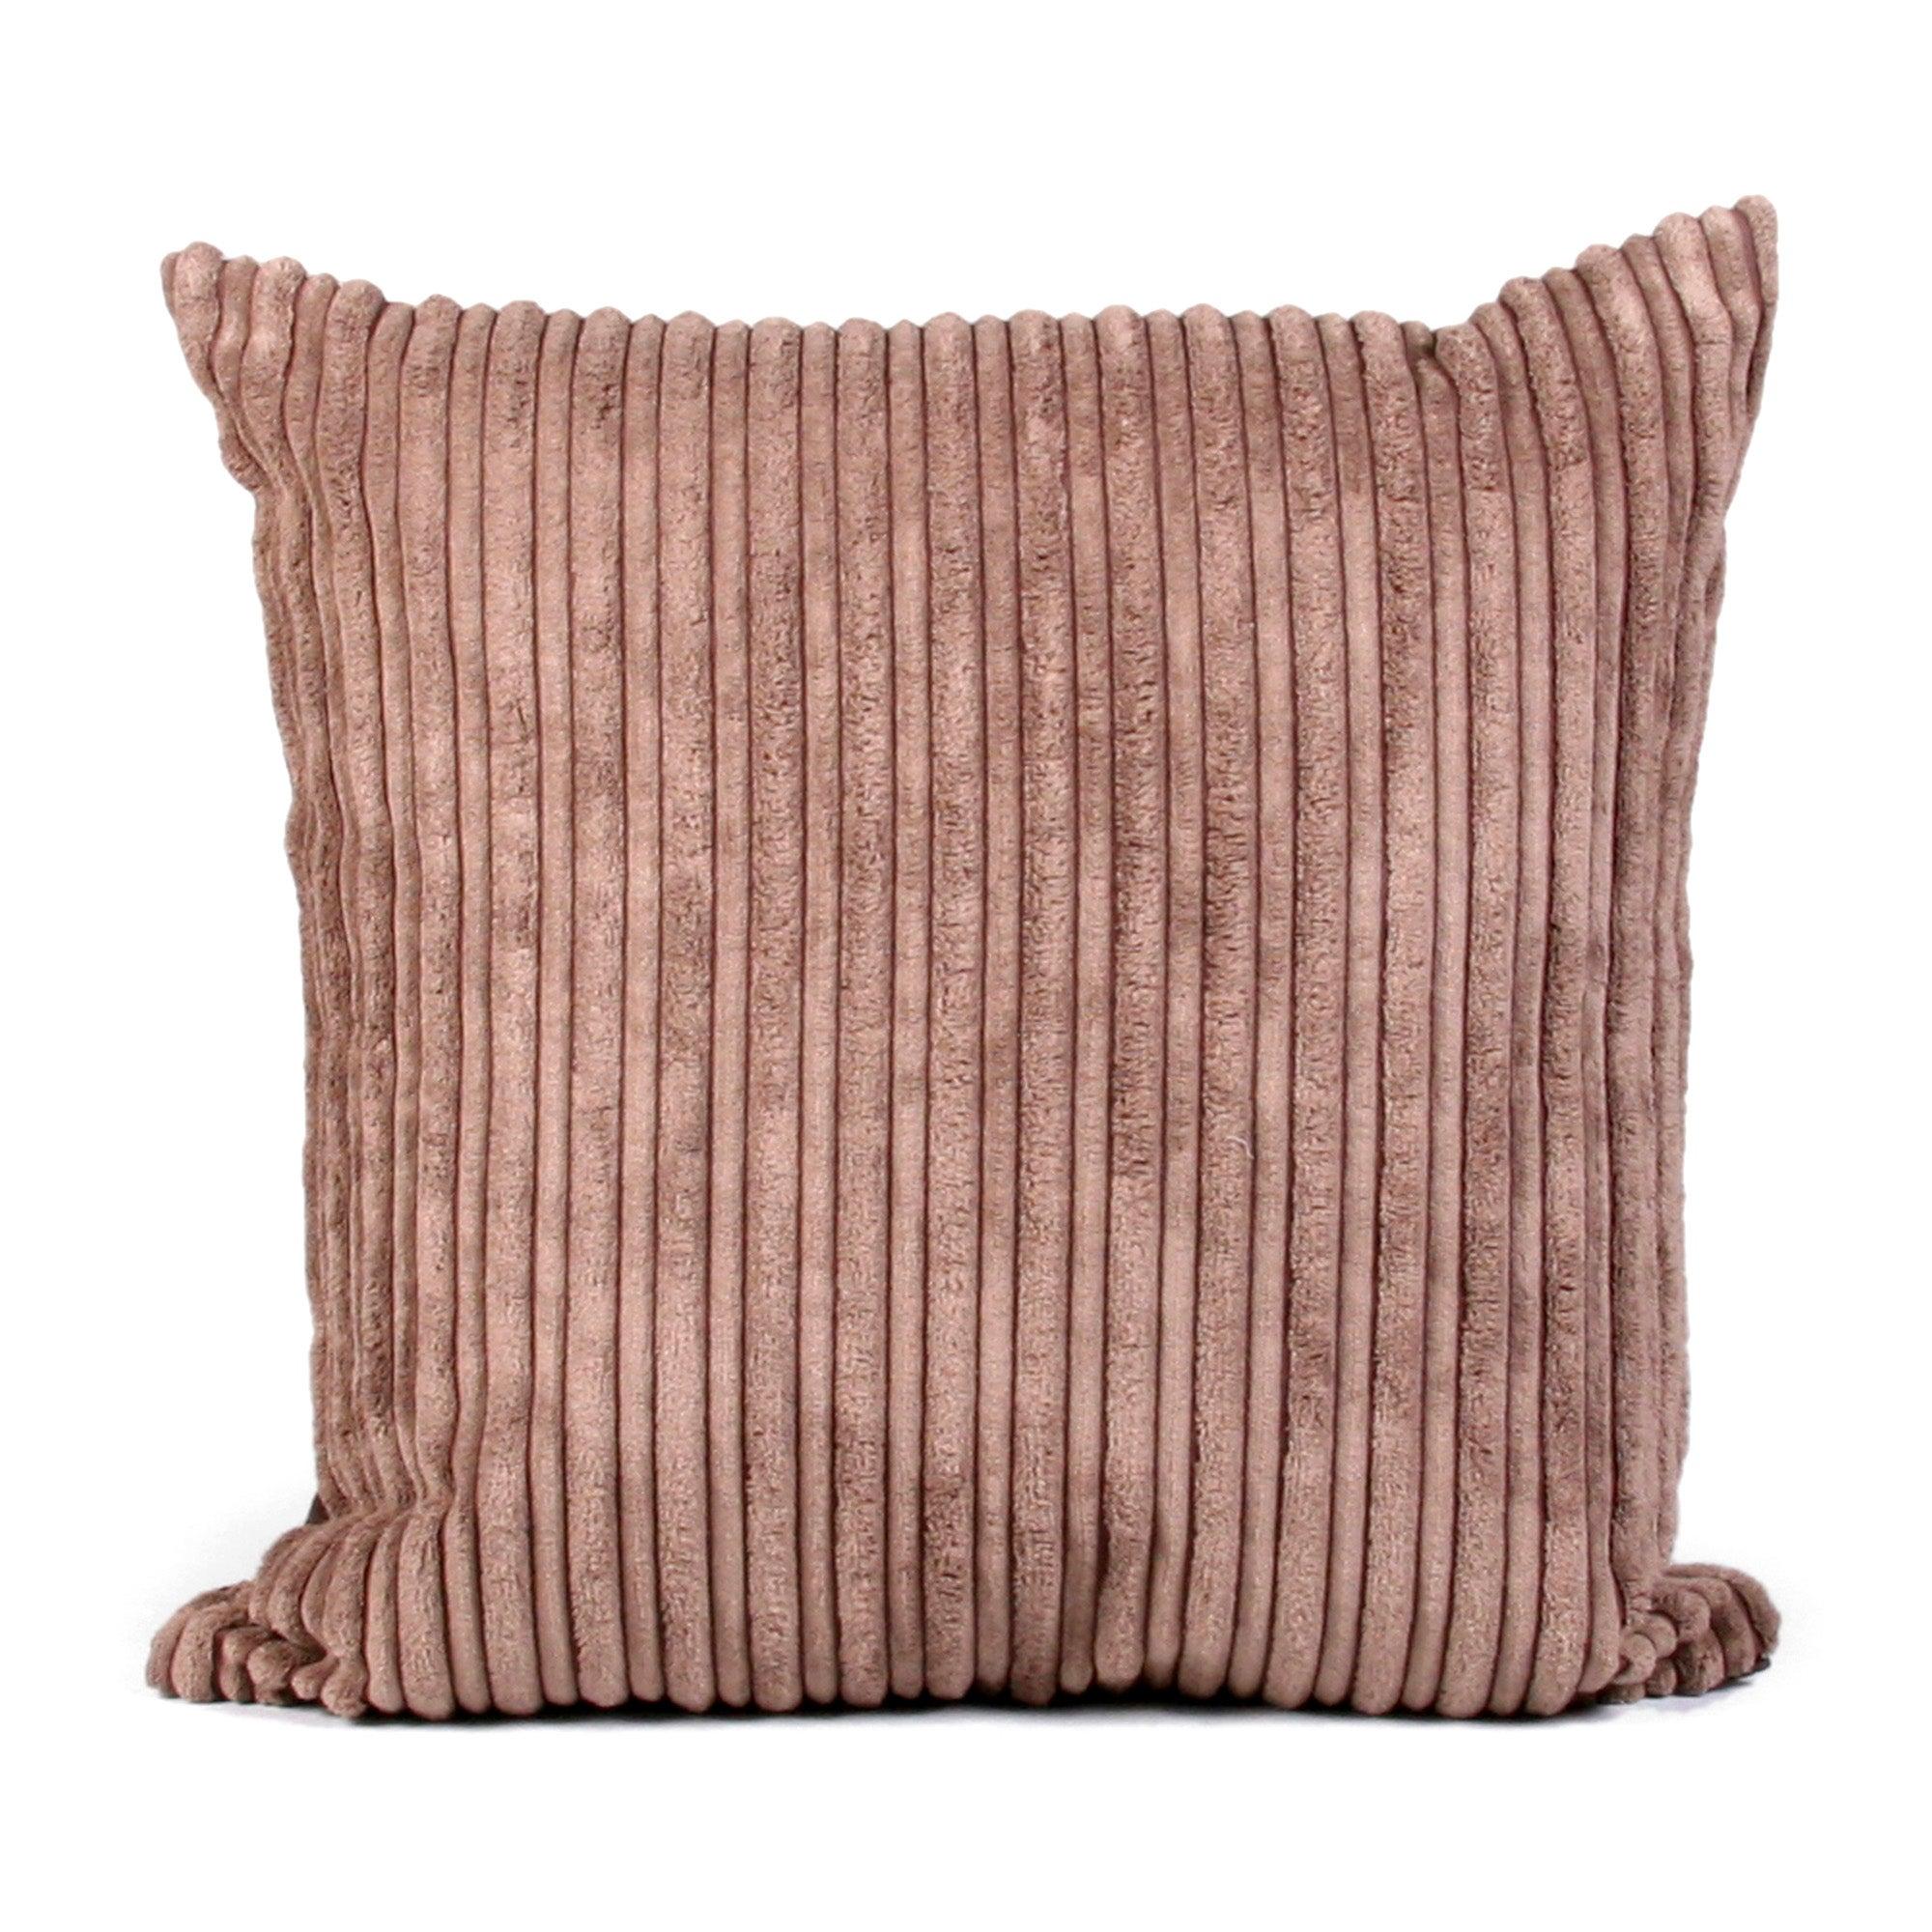 Chocolate Jumbo Cord Cushion